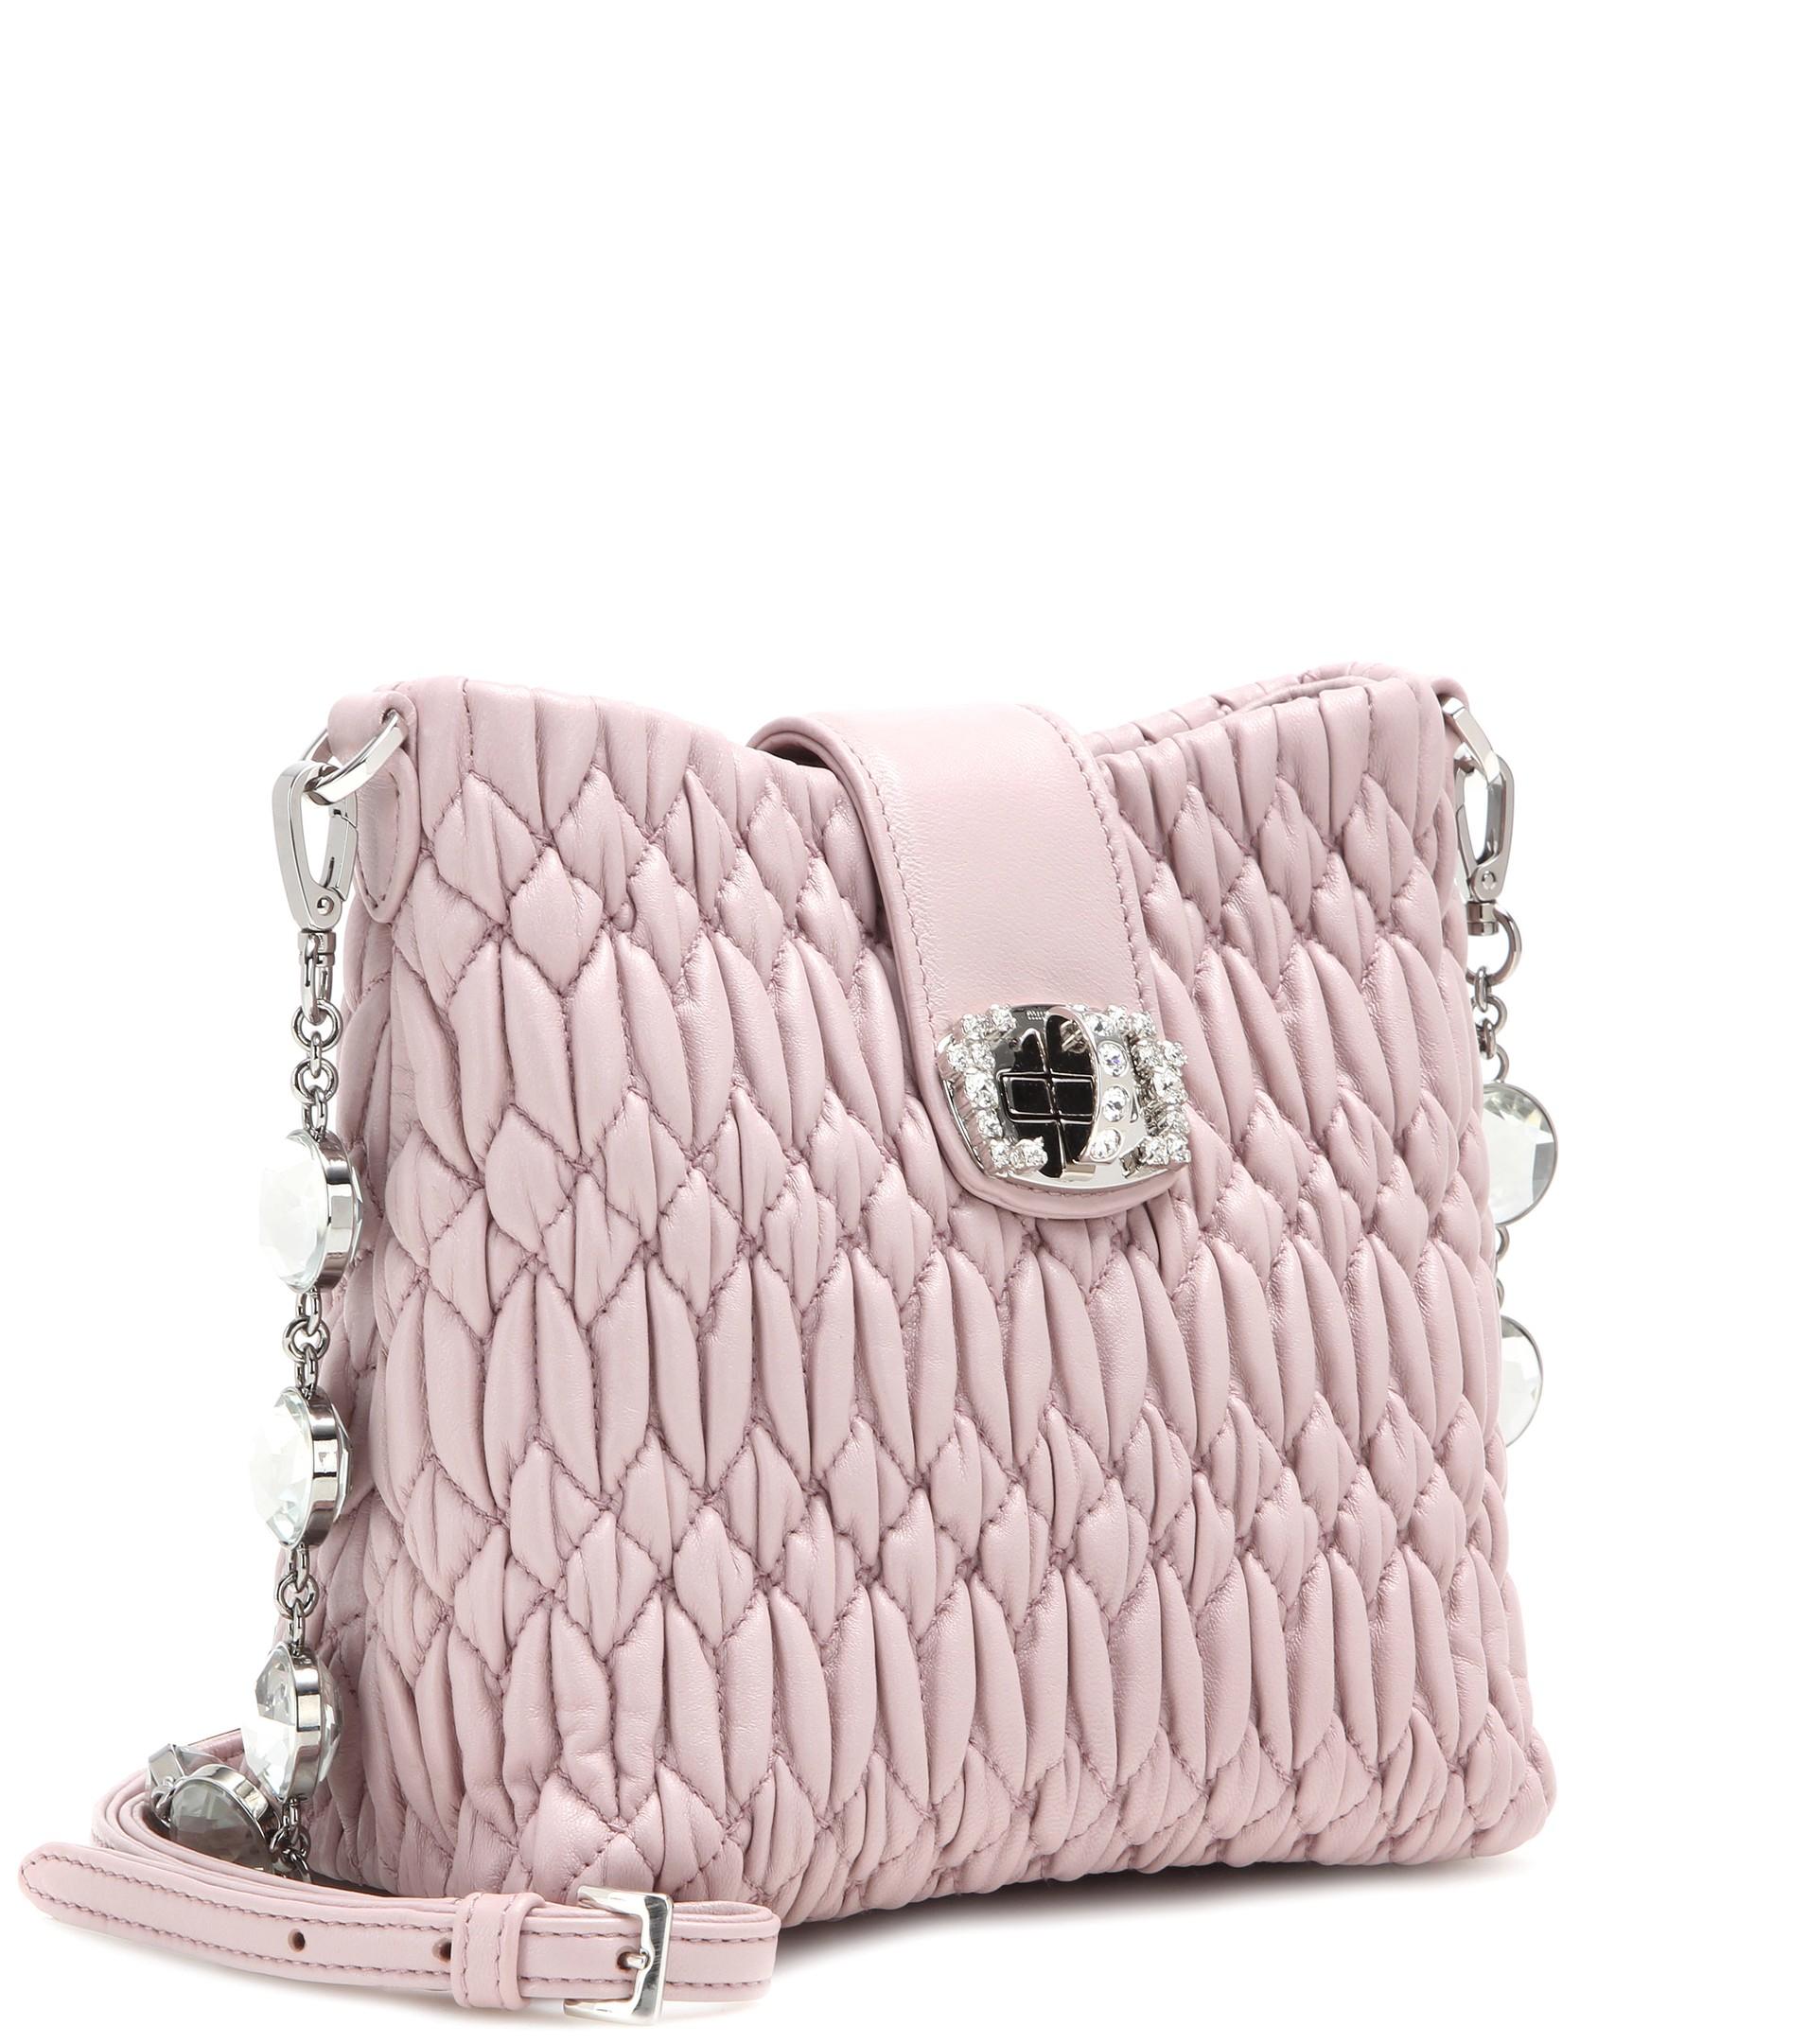 ffe334168096 miu miu outlet singapore - Miu miu Matelass¨¦ Leather Shoulder Bag in Pink (